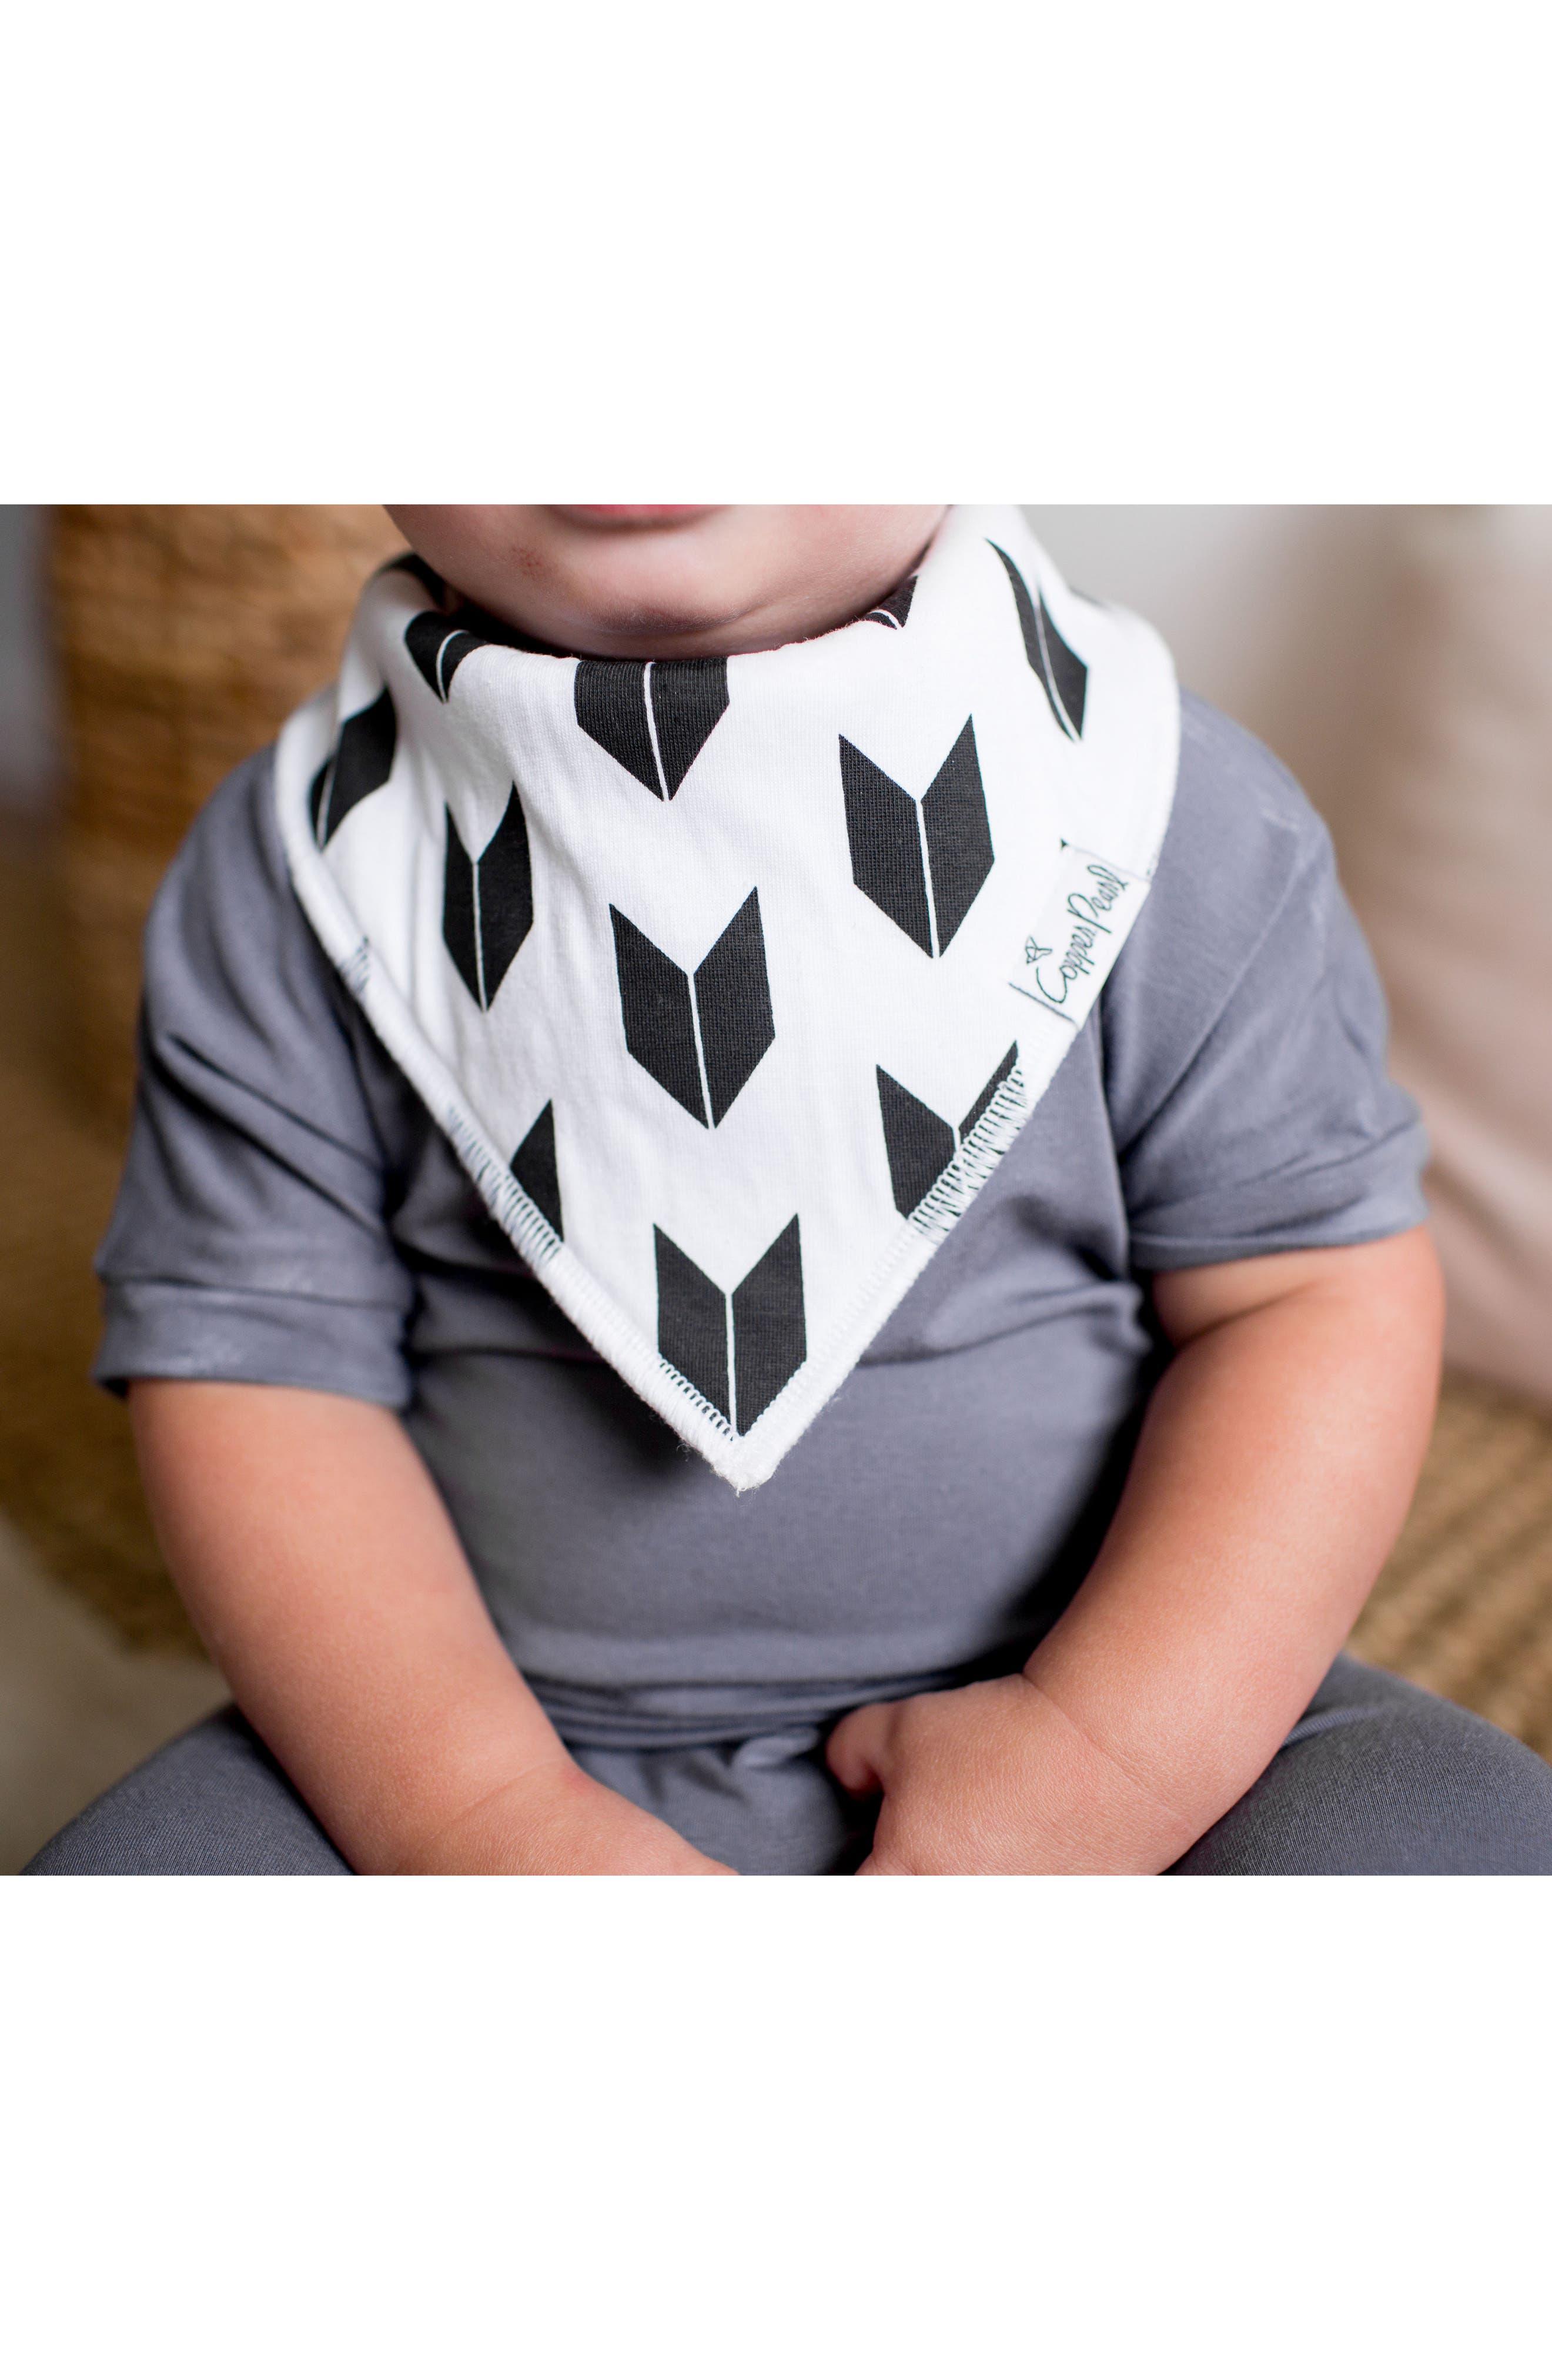 Shade Bib, Burp Cloth & Swaddle Blanket Gift Set,                             Alternate thumbnail 4, color,                             SHADE